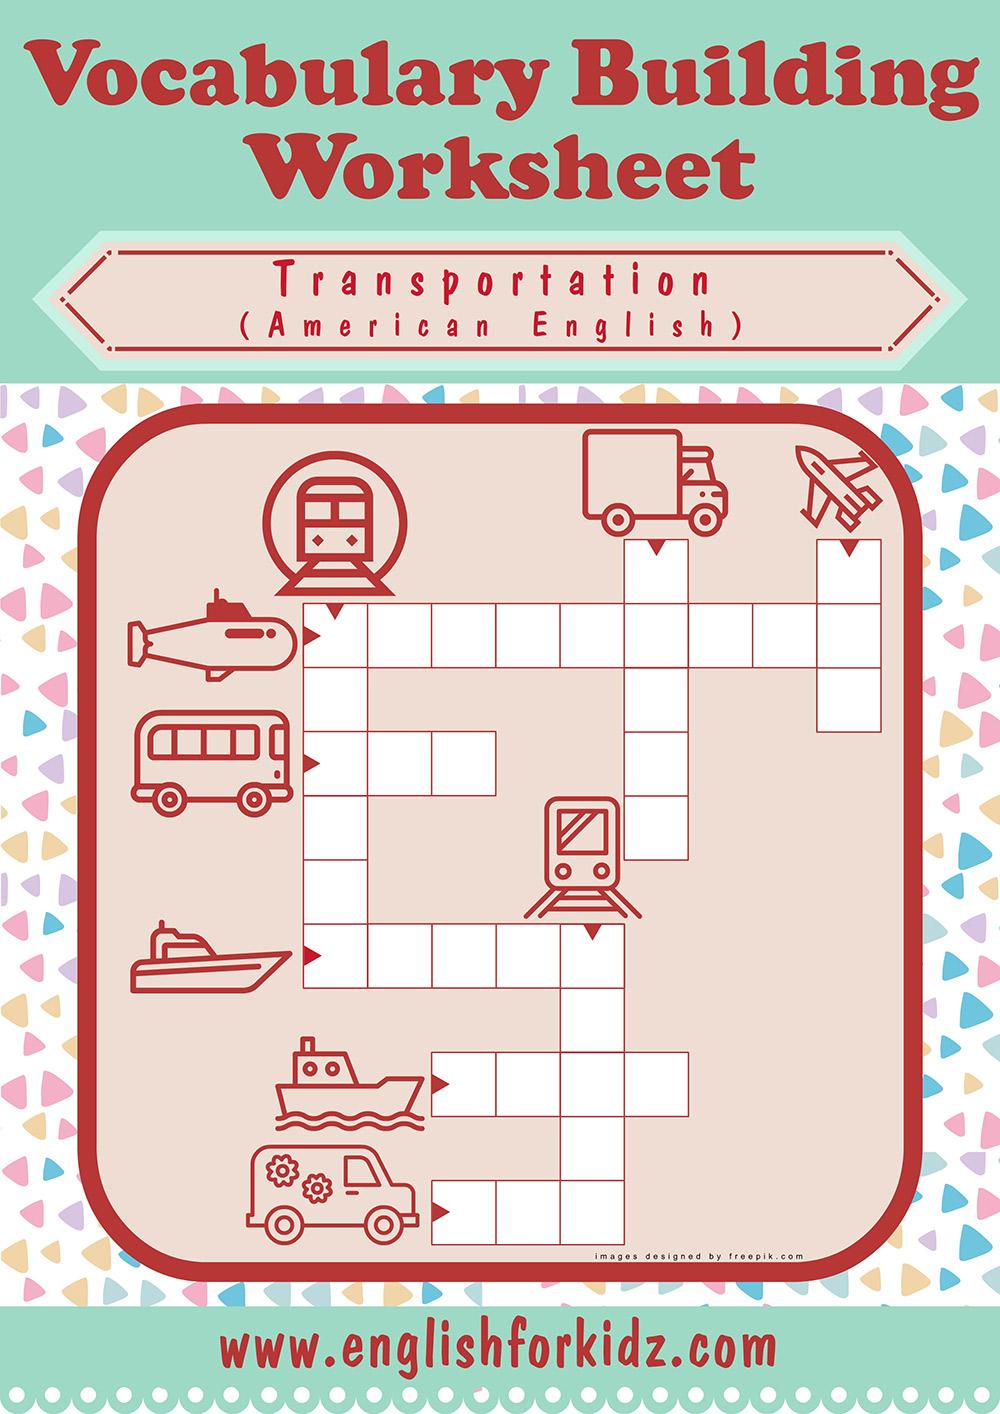 Transportation Worksheets: Crossword Puzzles - Printable Transportation Puzzles